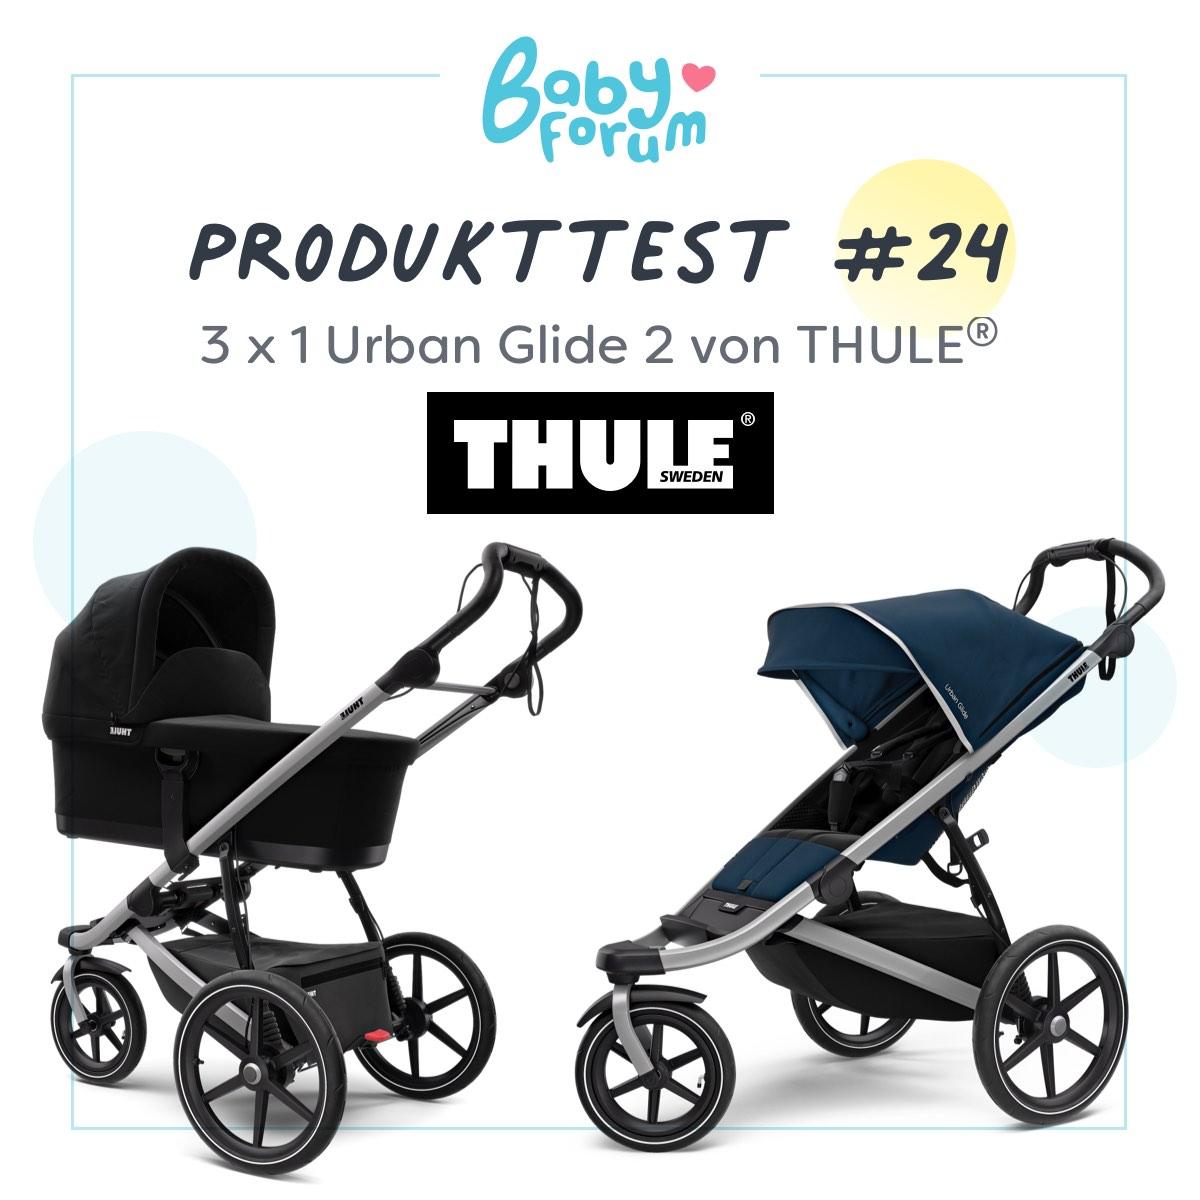 24-Produkttest-THULE-UrbanGlide2-BBF-1200.jpg